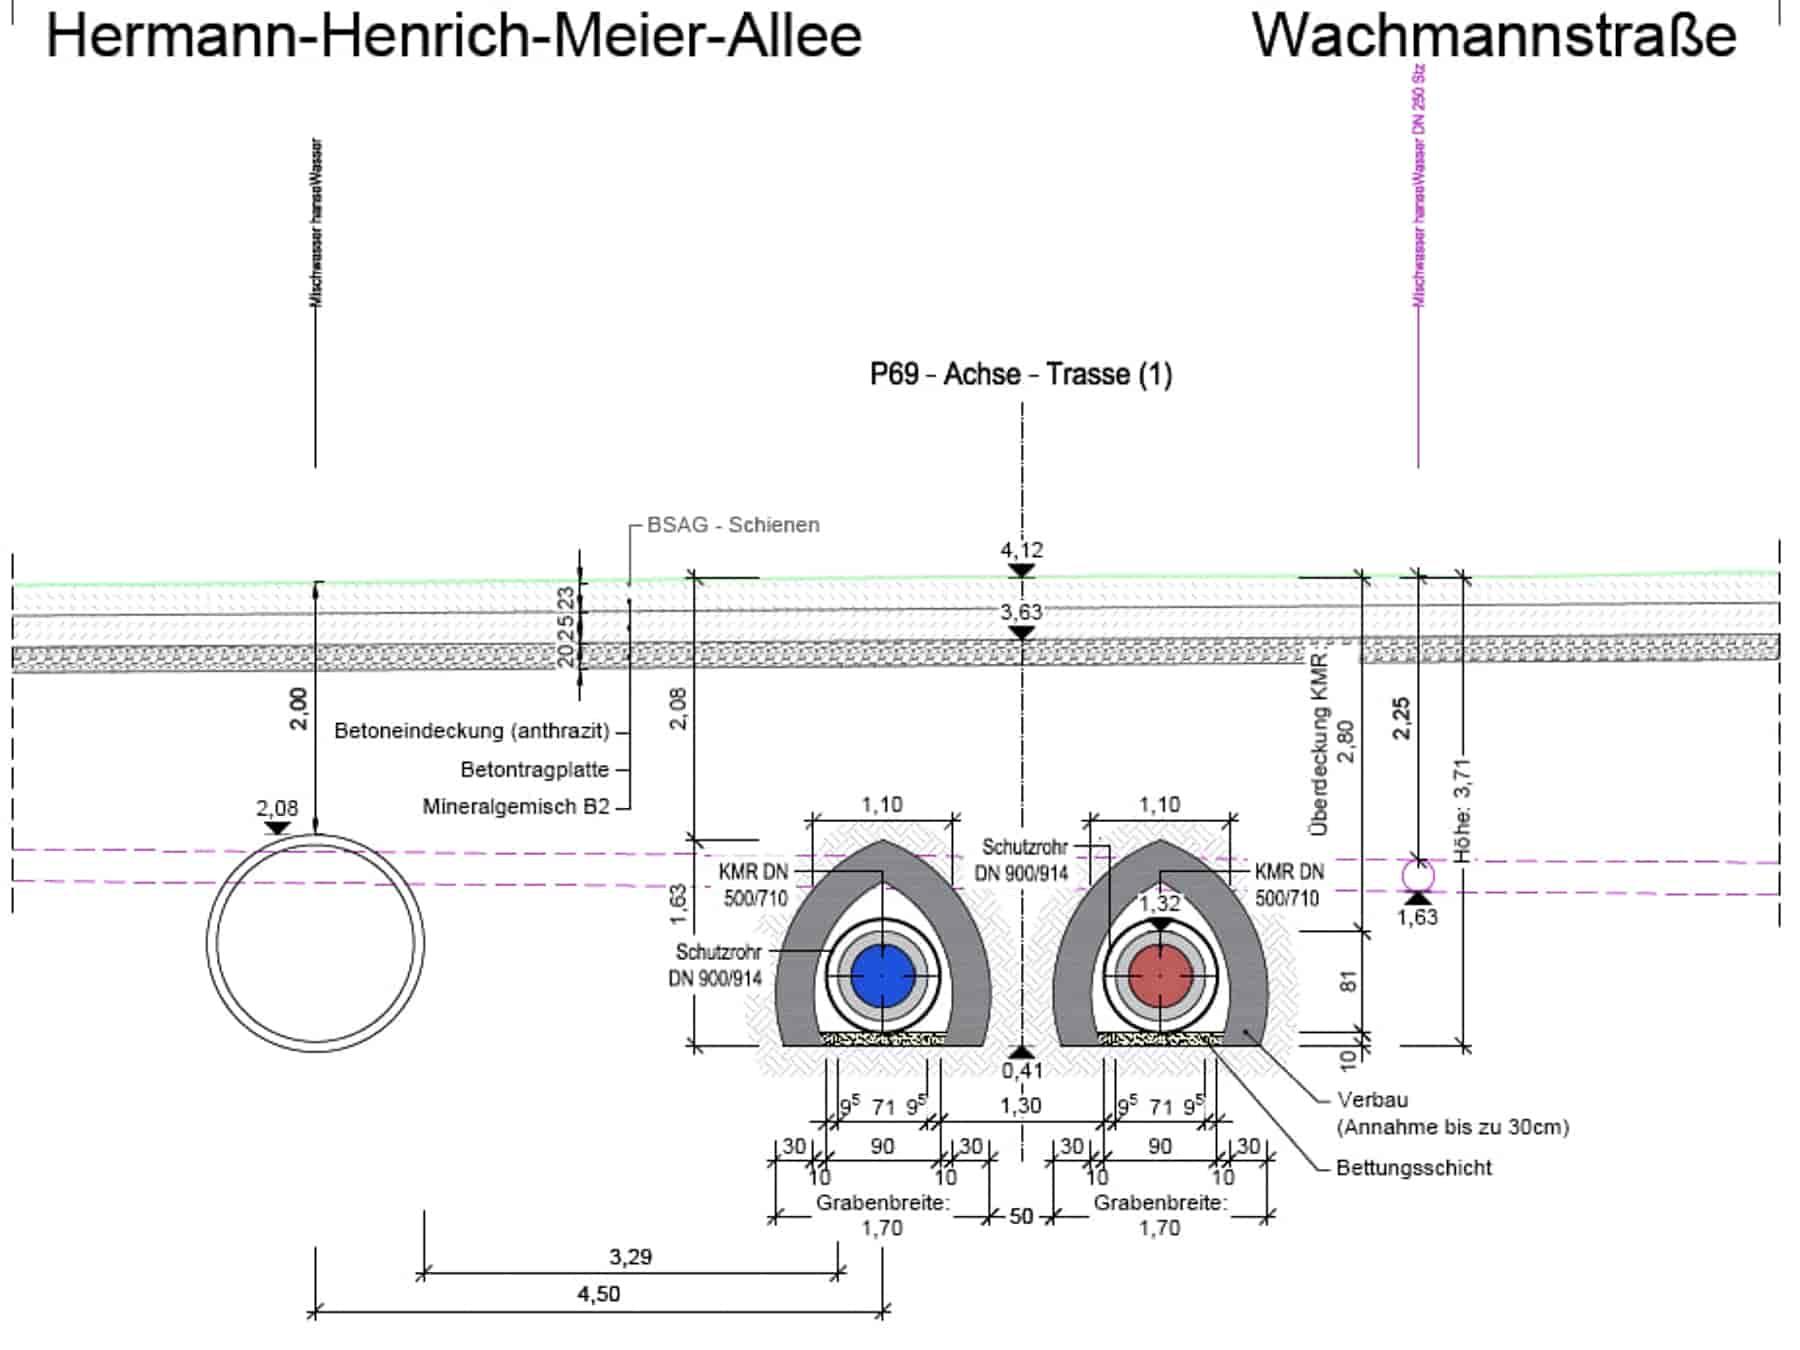 Ingenieurbüro Nebel - Ingenieurbüro Mespelbrunn - Projekt - Fernwämre Bremen